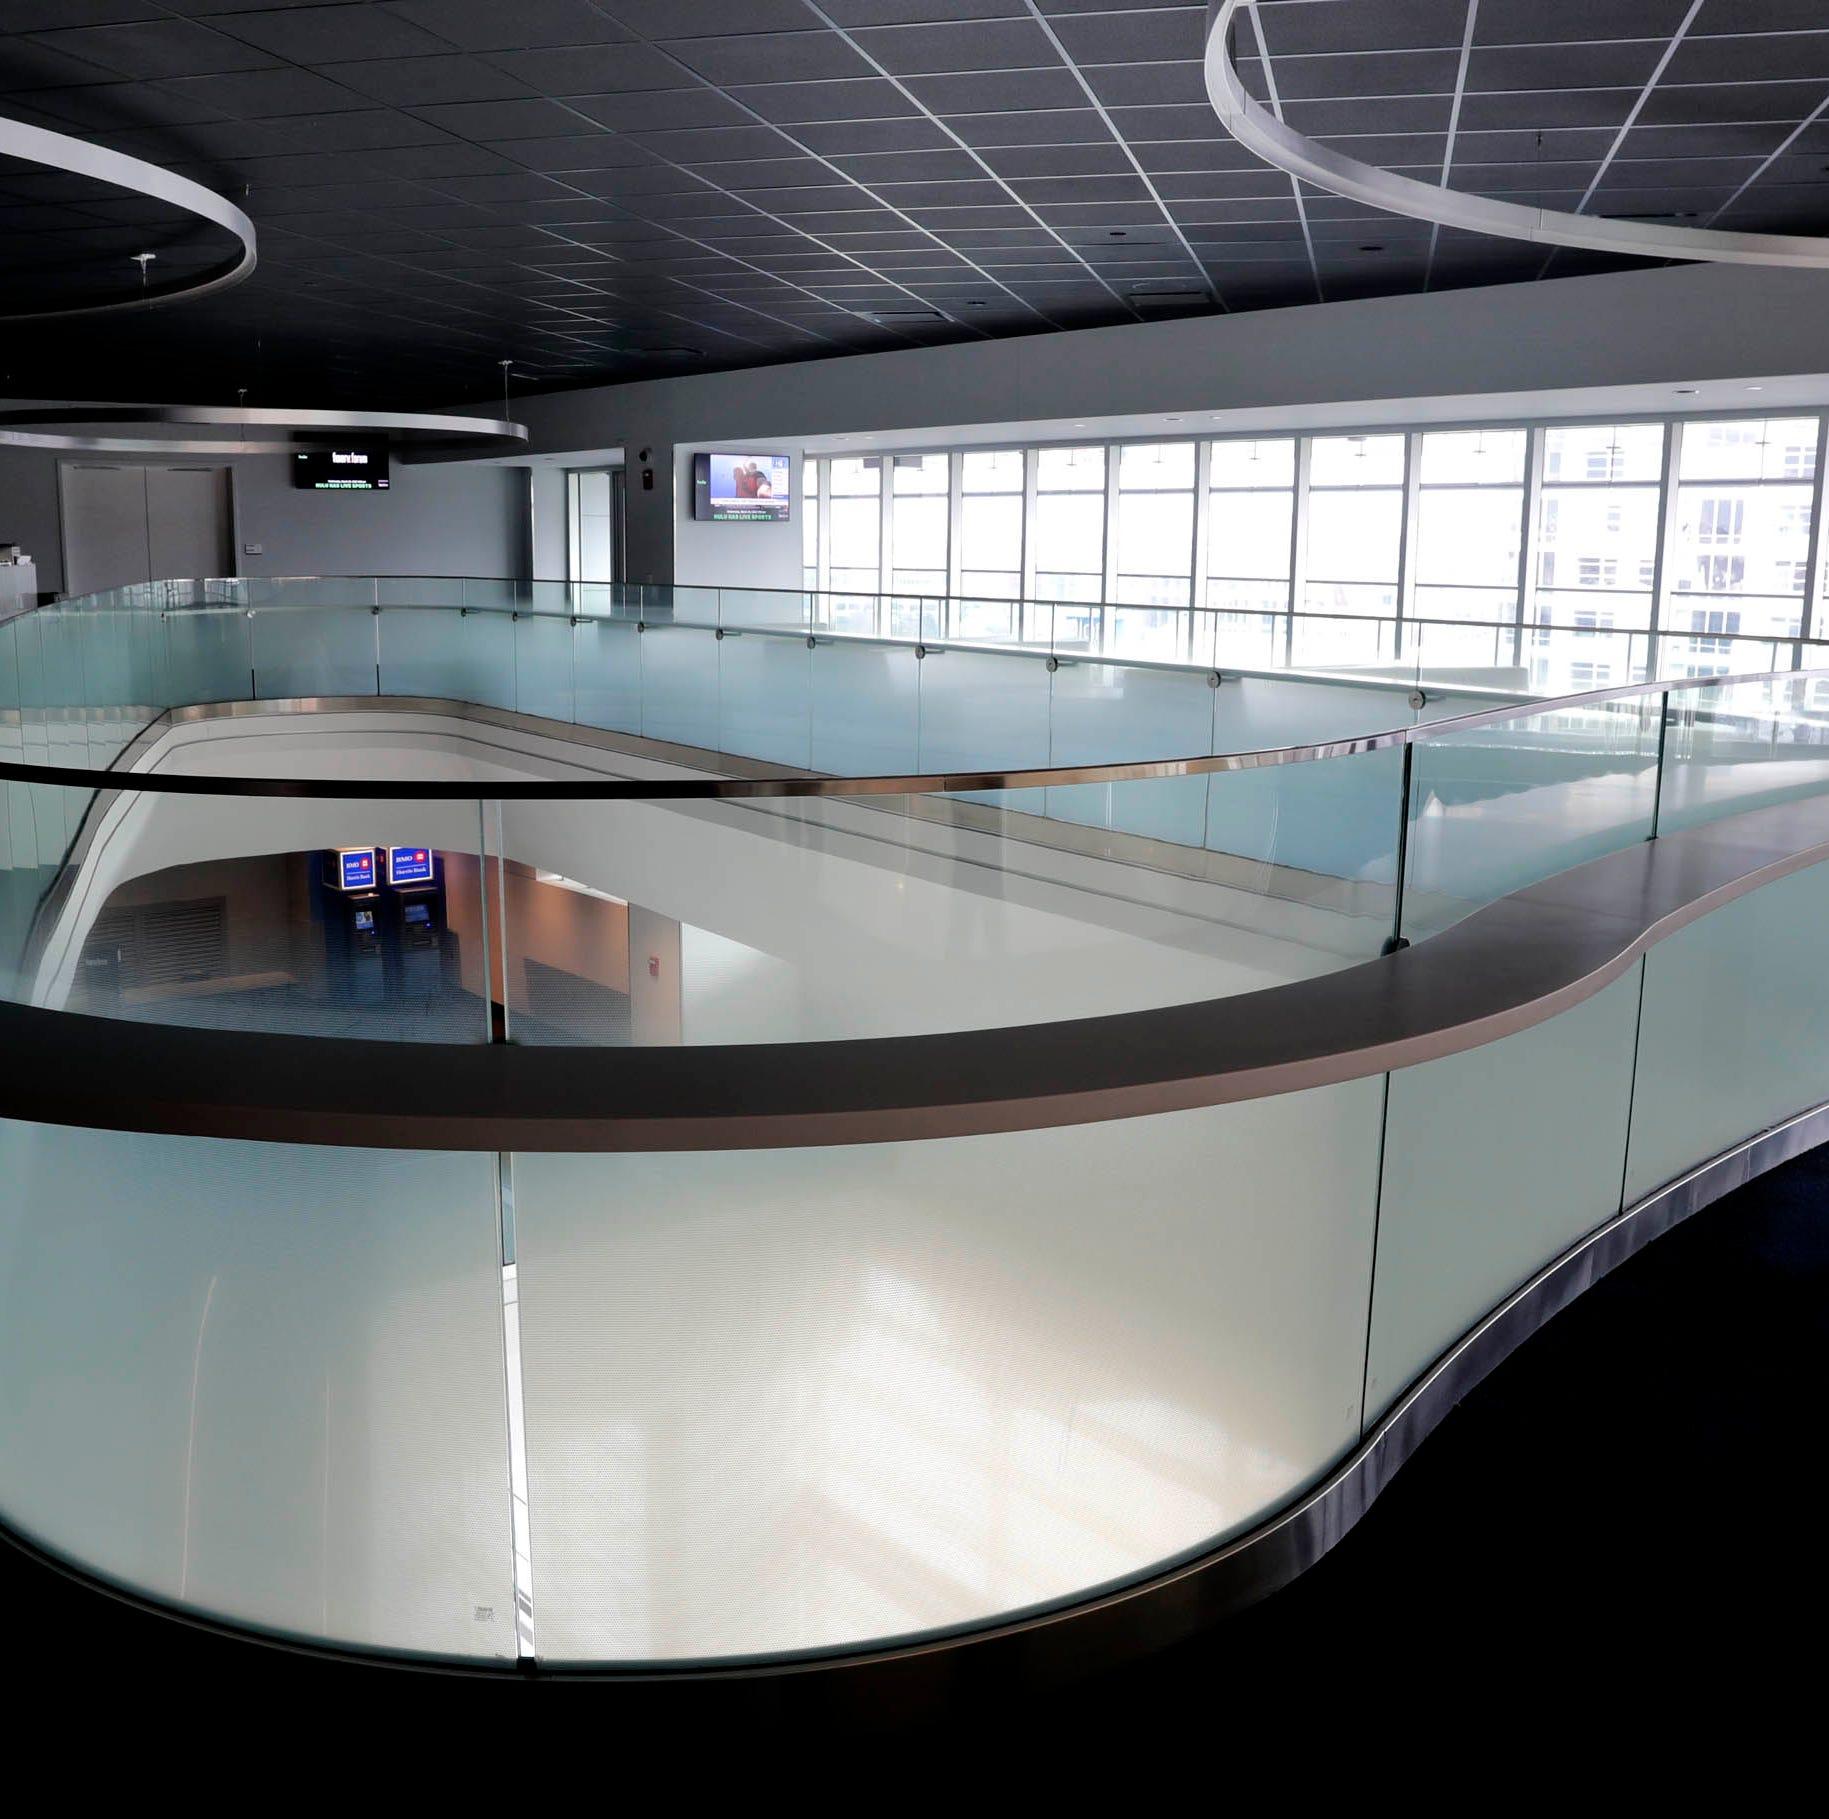 Milwaukee Bucks to replace 3,000 cup holders, make Fiserv Forum atrium a little less dizzying